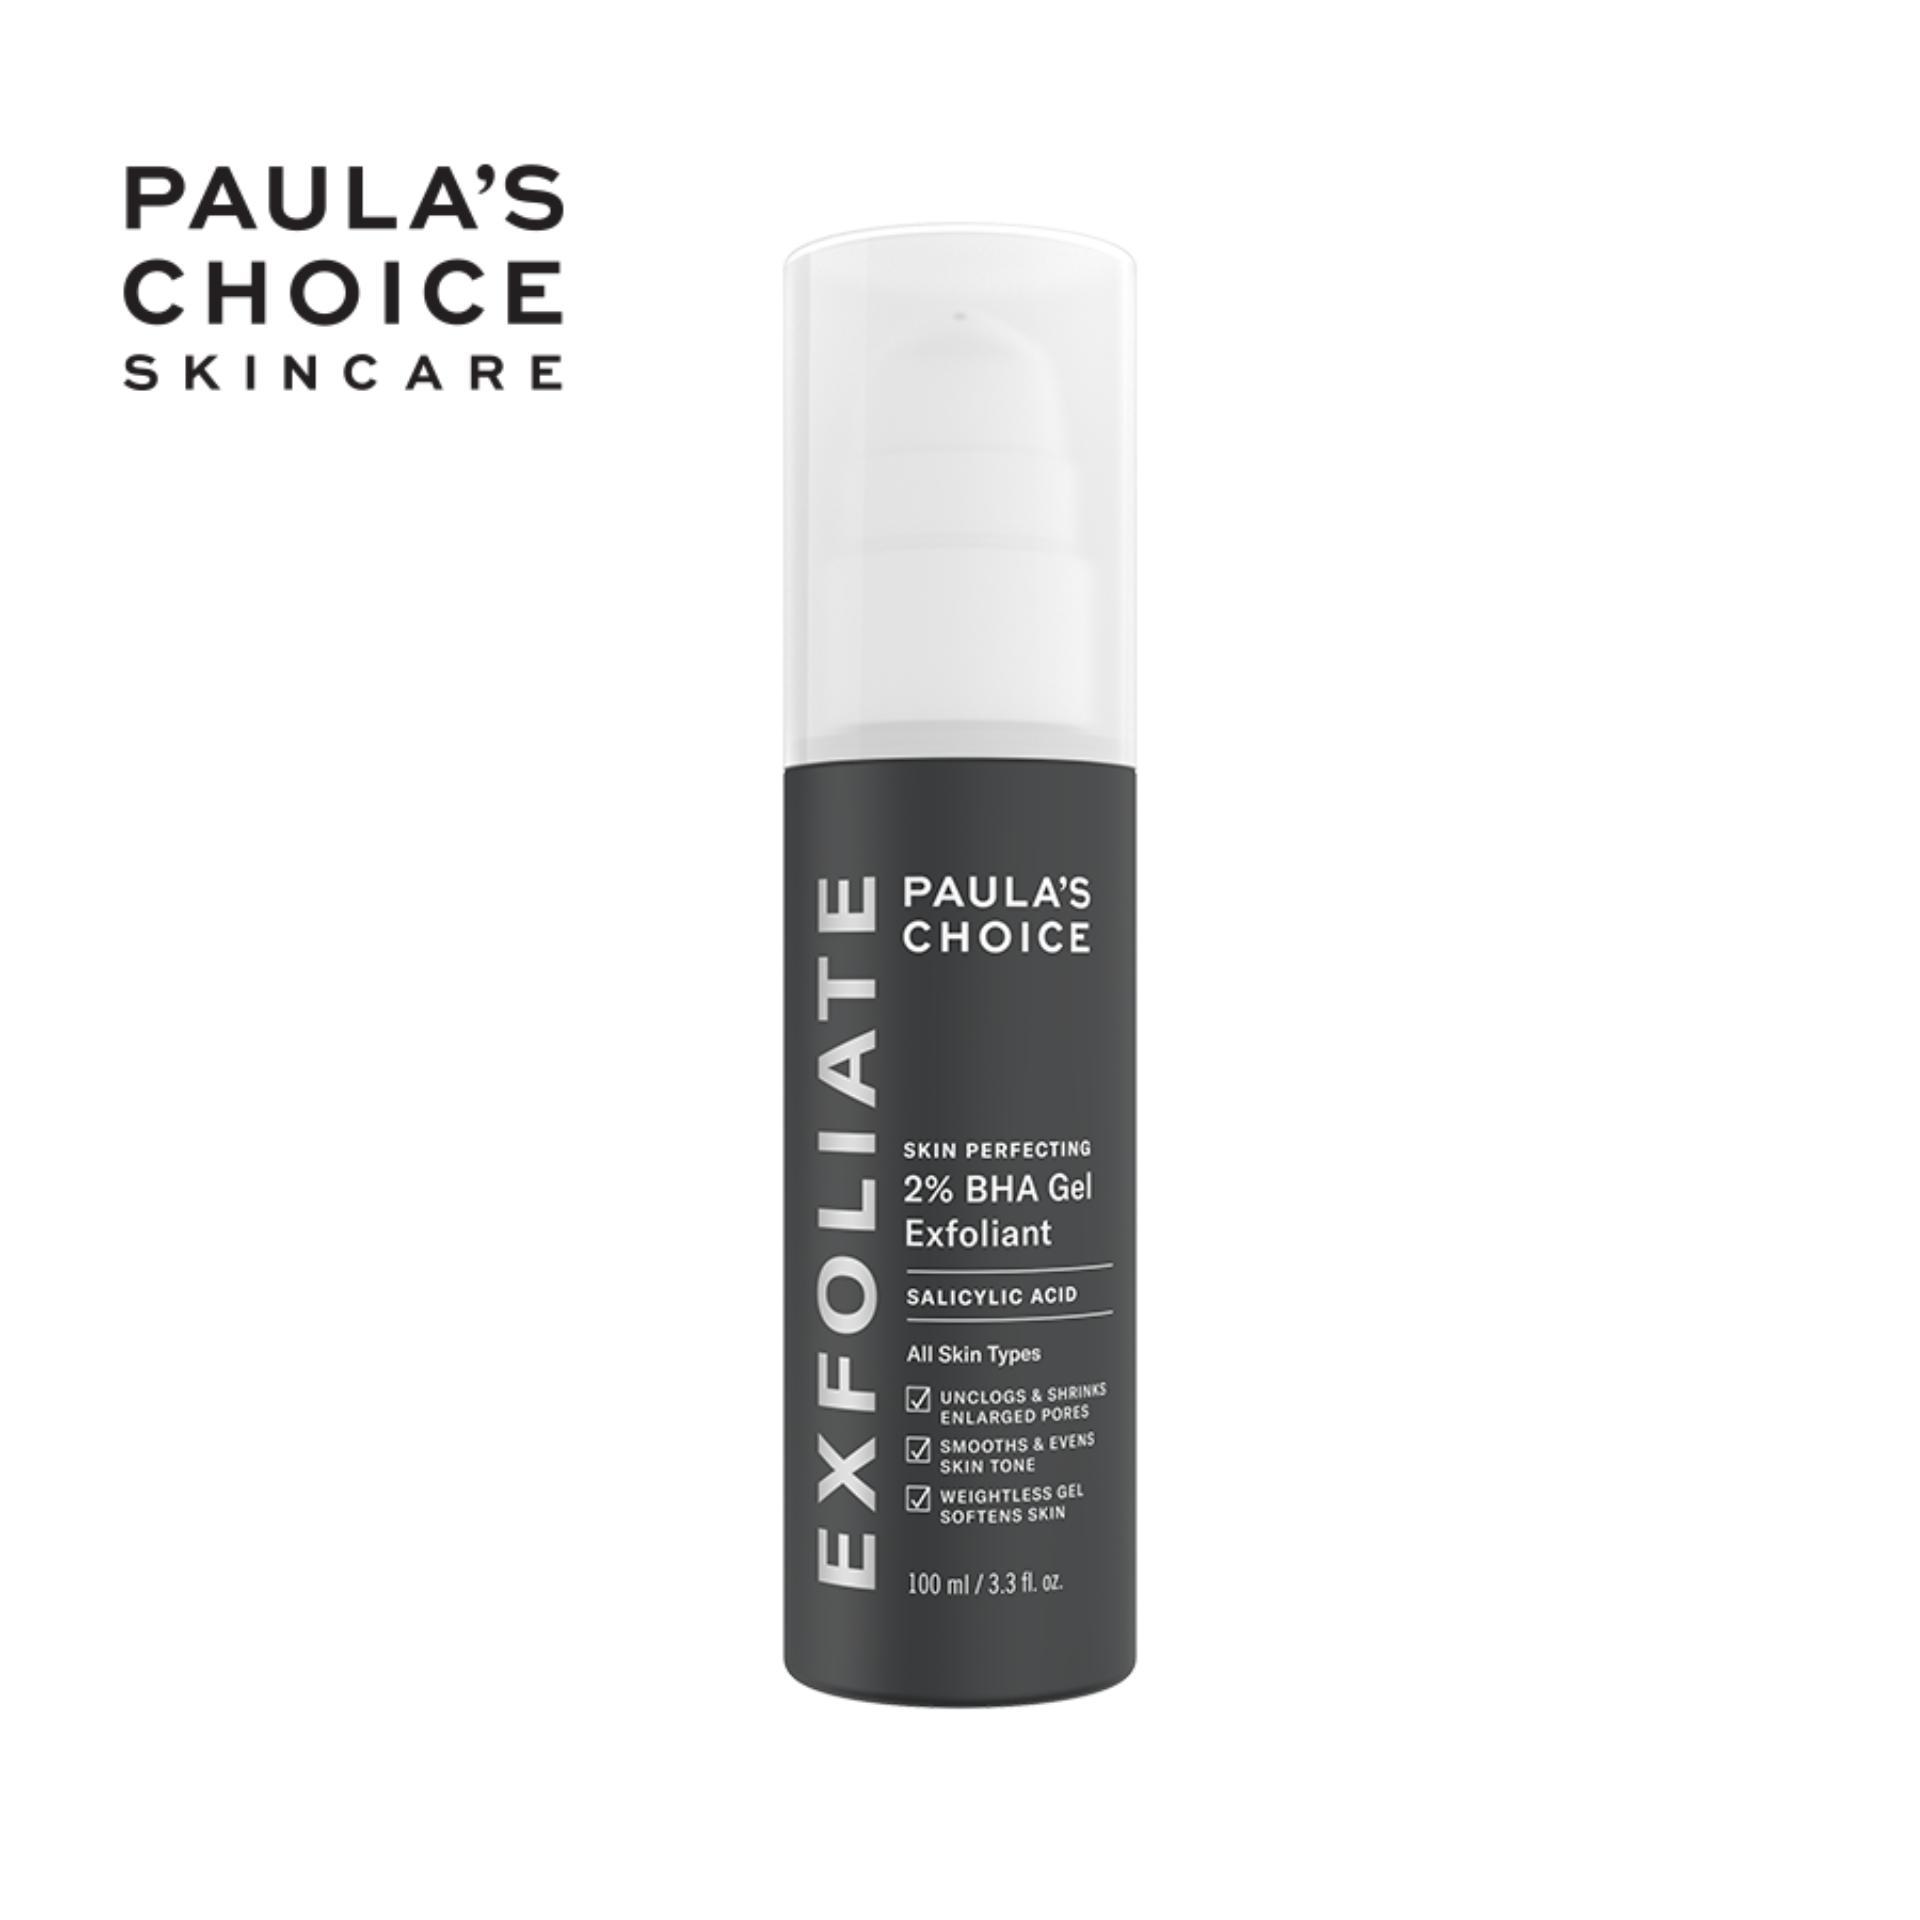 Kem loại bỏ tế bào chết Paula's Choice Skin Perfecting 2% BHA Gel Exfoliant 100ml-2040